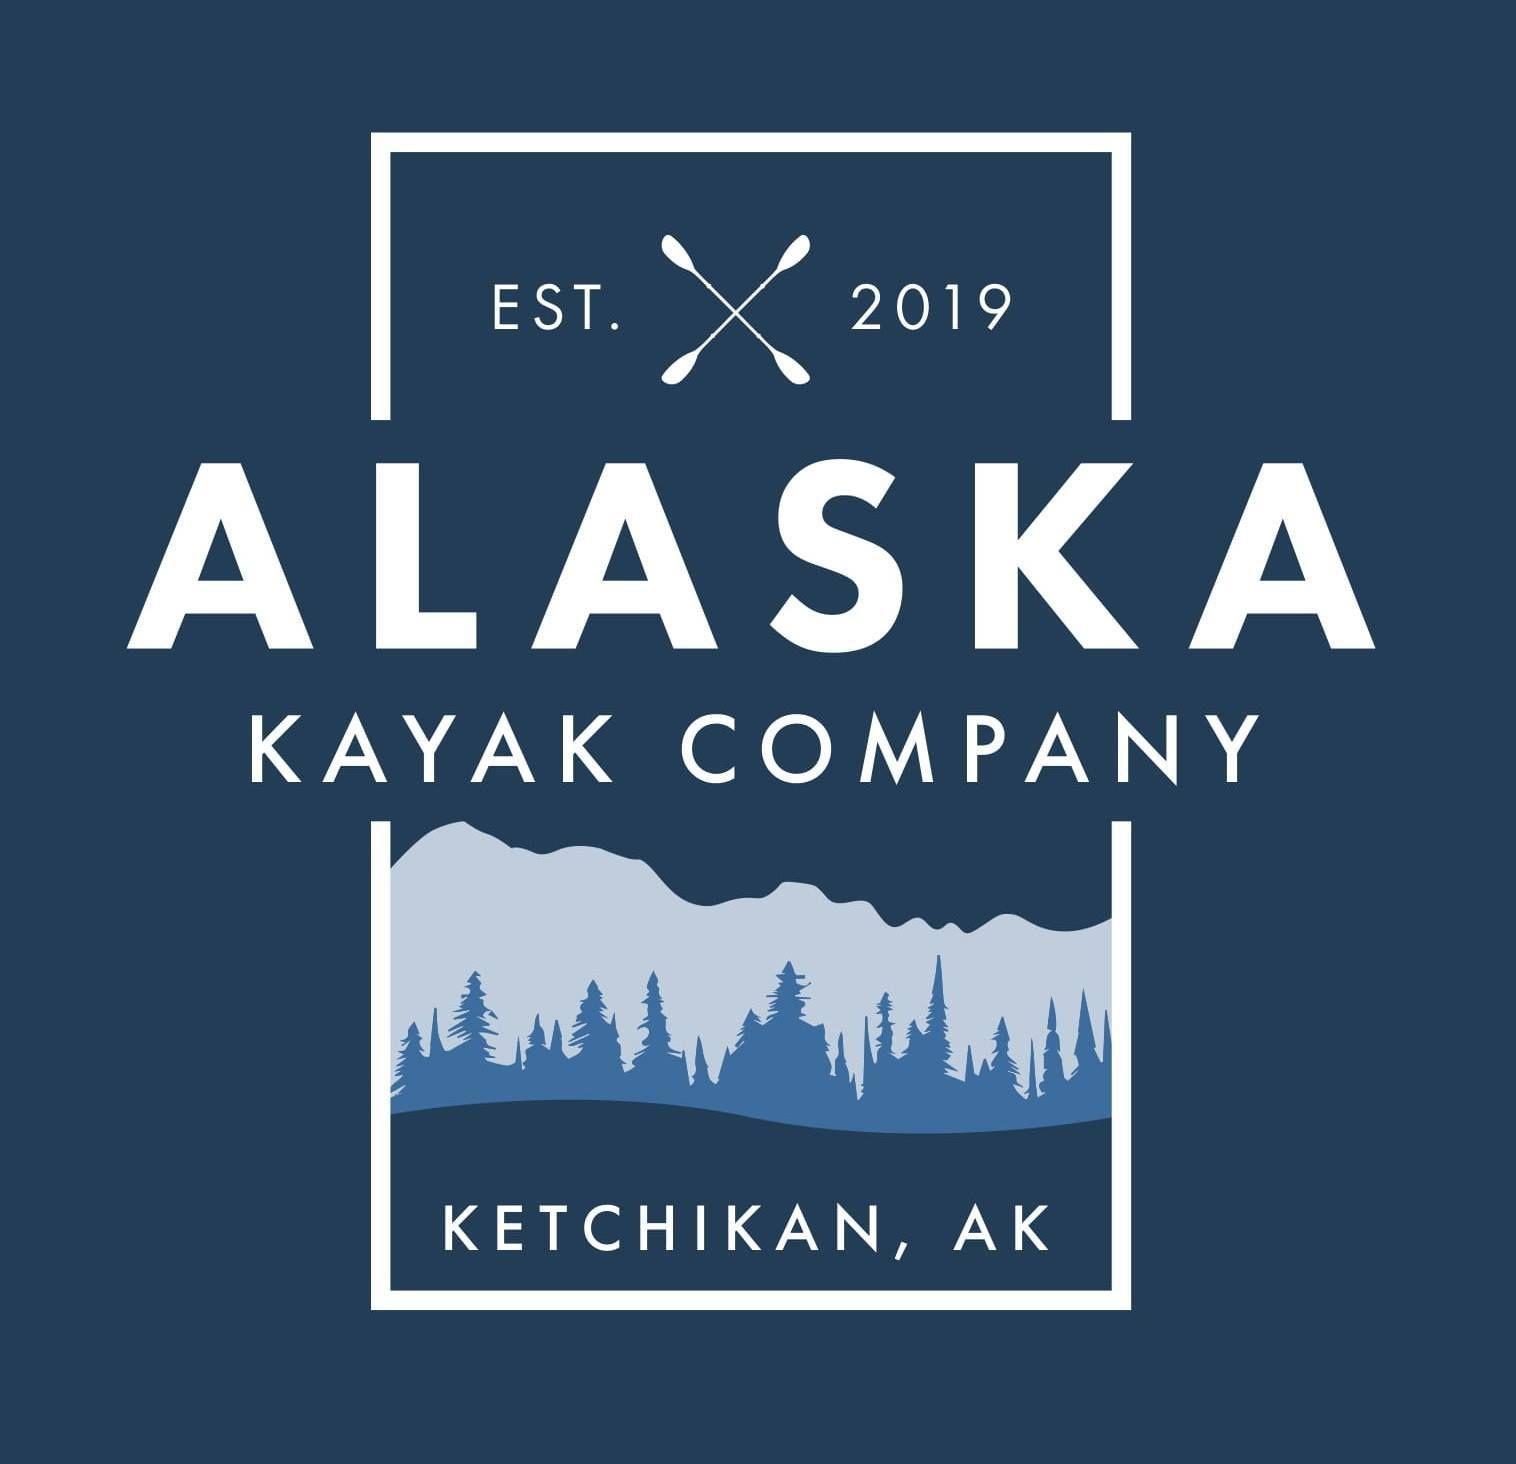 Alaska Kayak Company